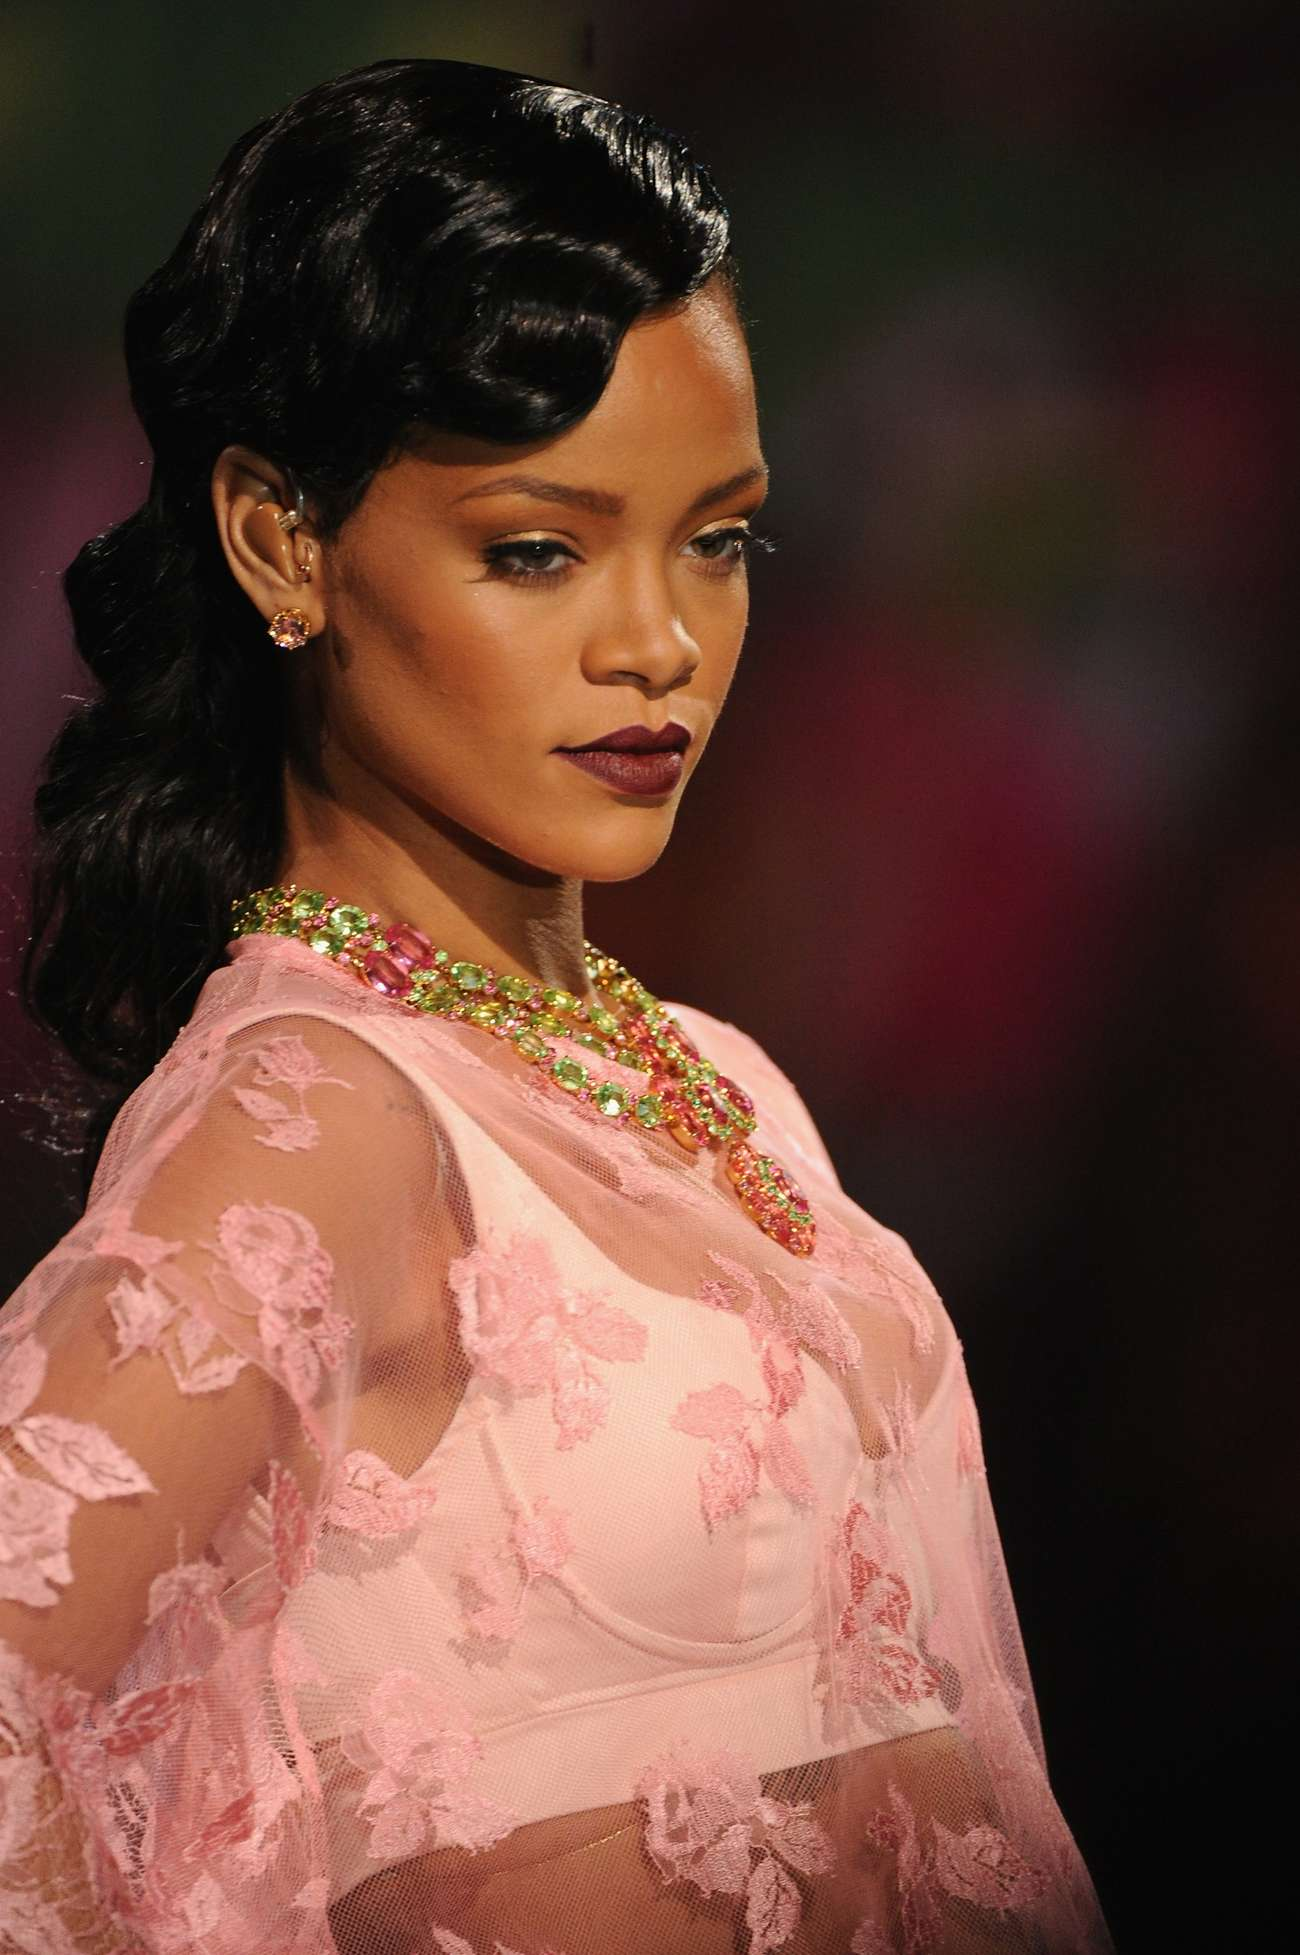 Rihanna Rocks Catwalk at Victorias Secret Fashion Show 2012 Photos  Scopecube